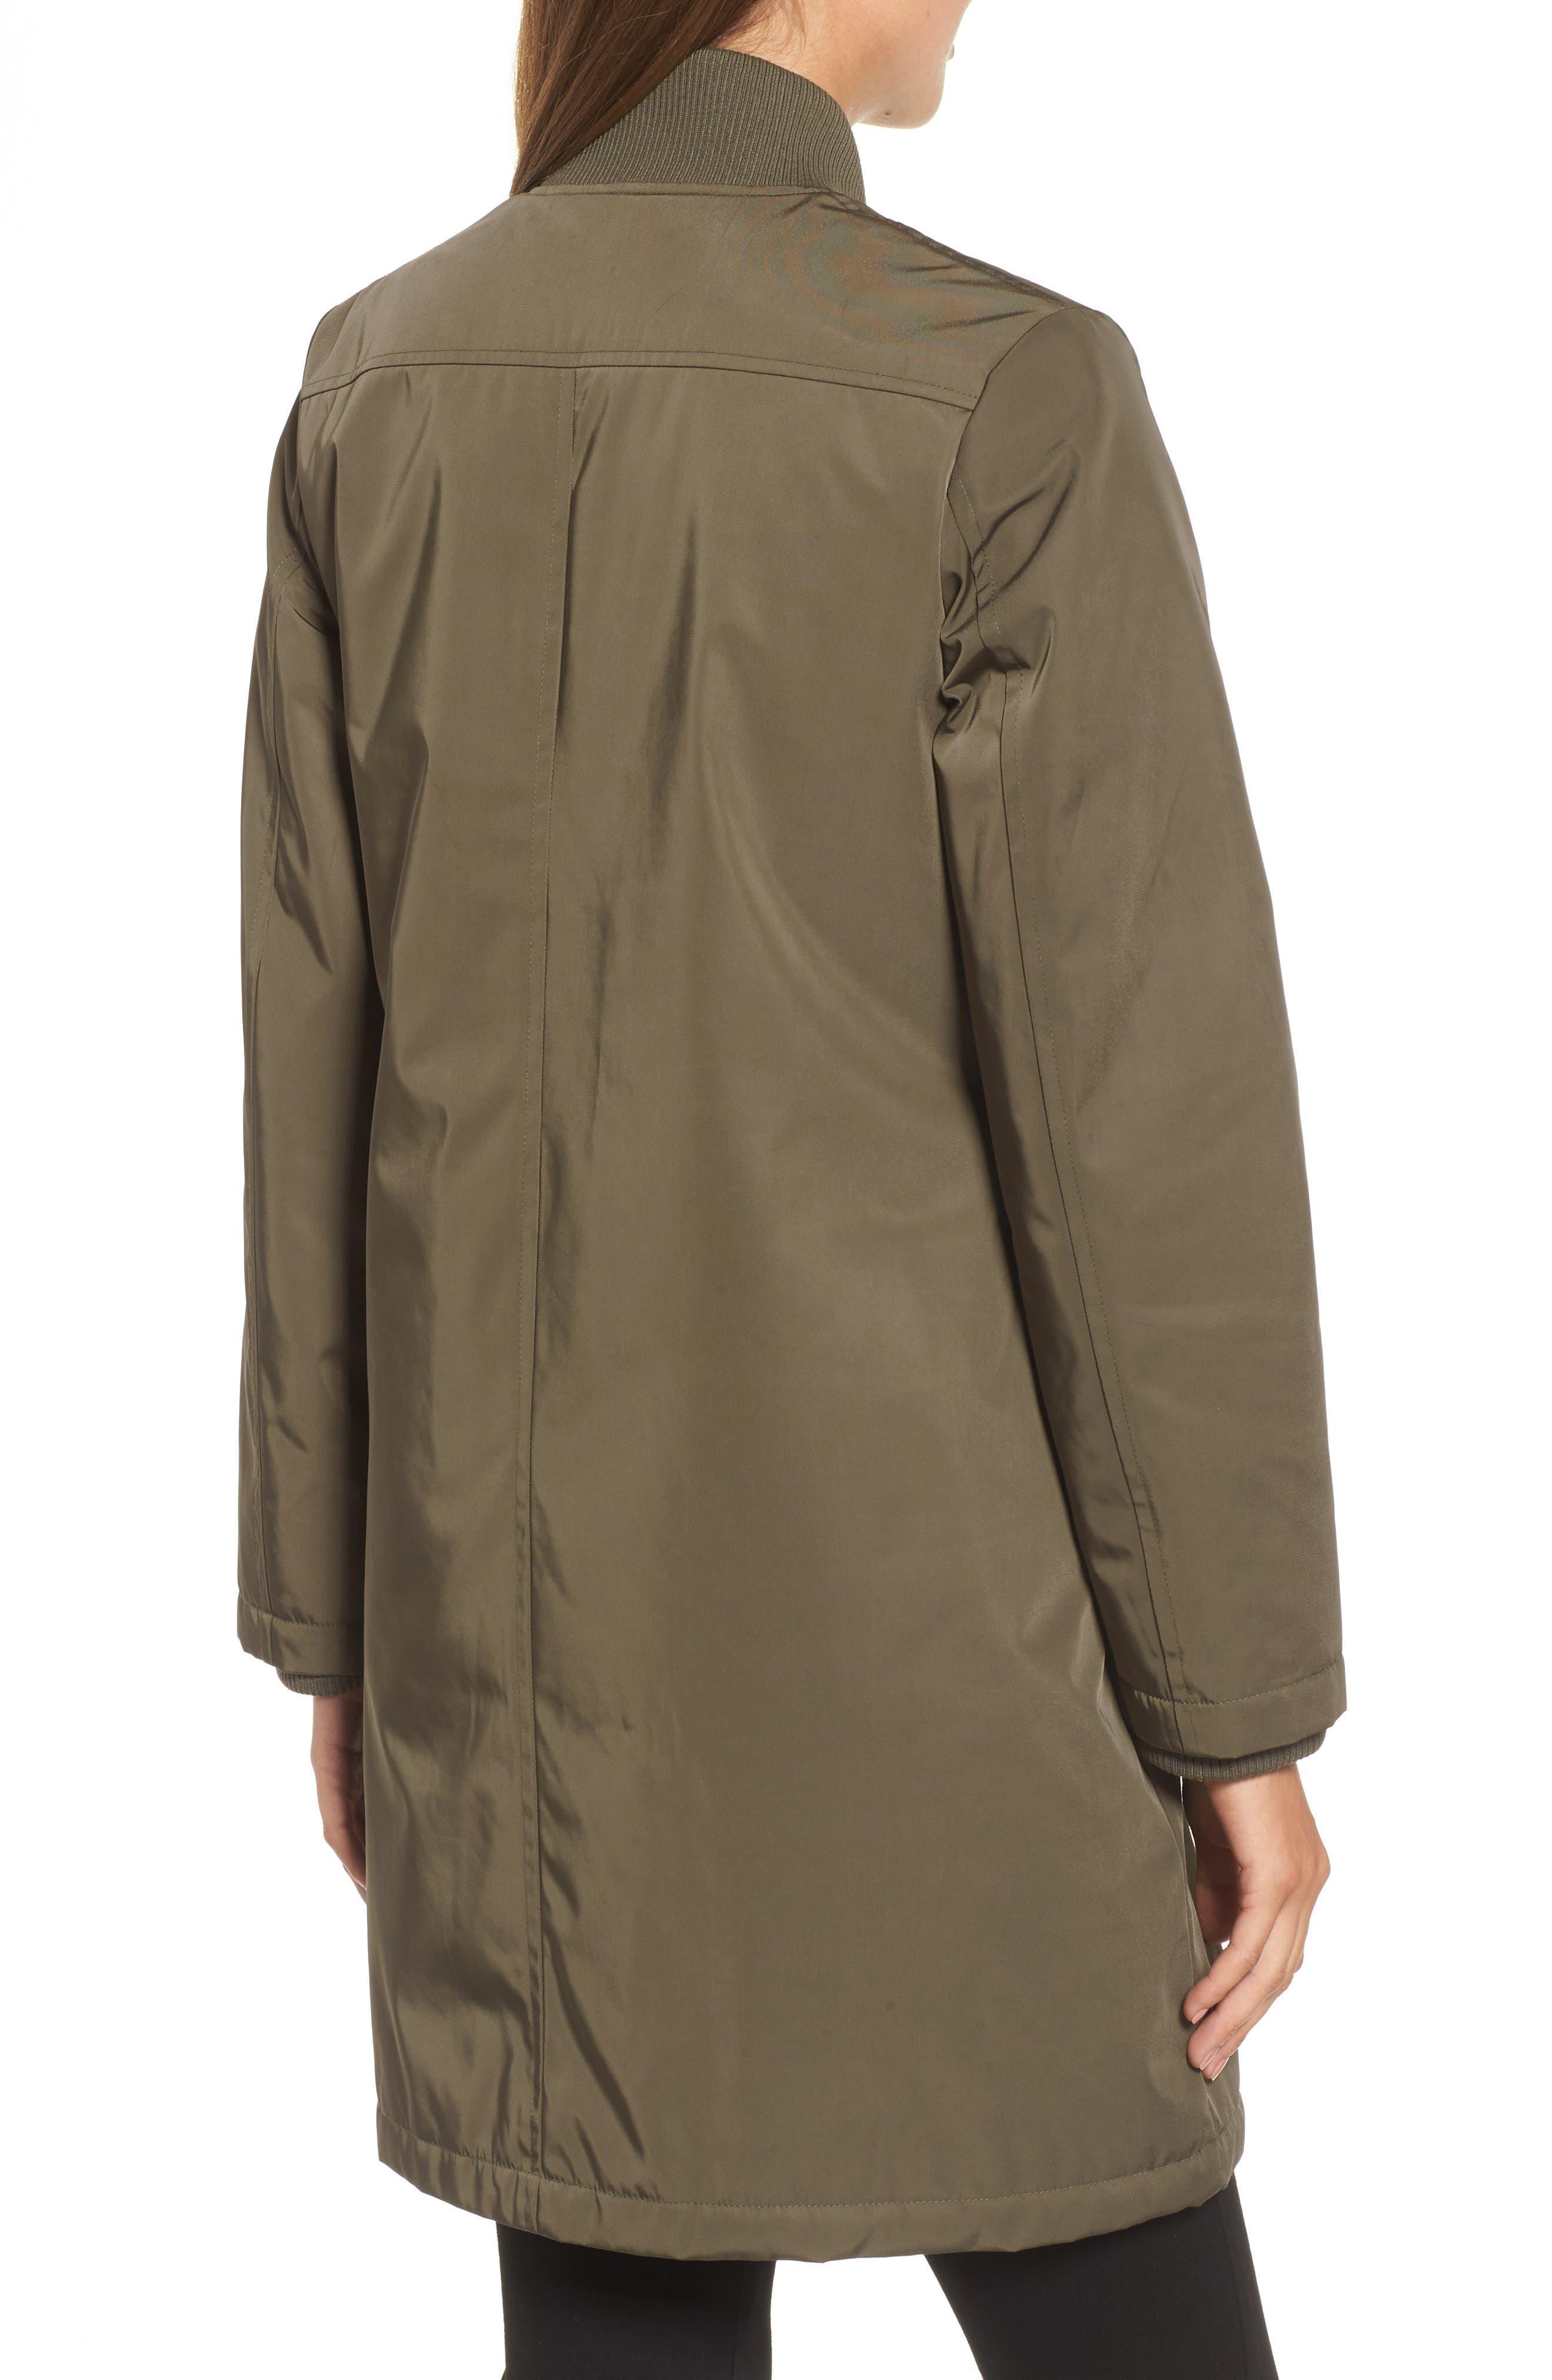 Calson<sup>®</sup> Long Bomber Jacket,                             Alternate thumbnail 4, color,